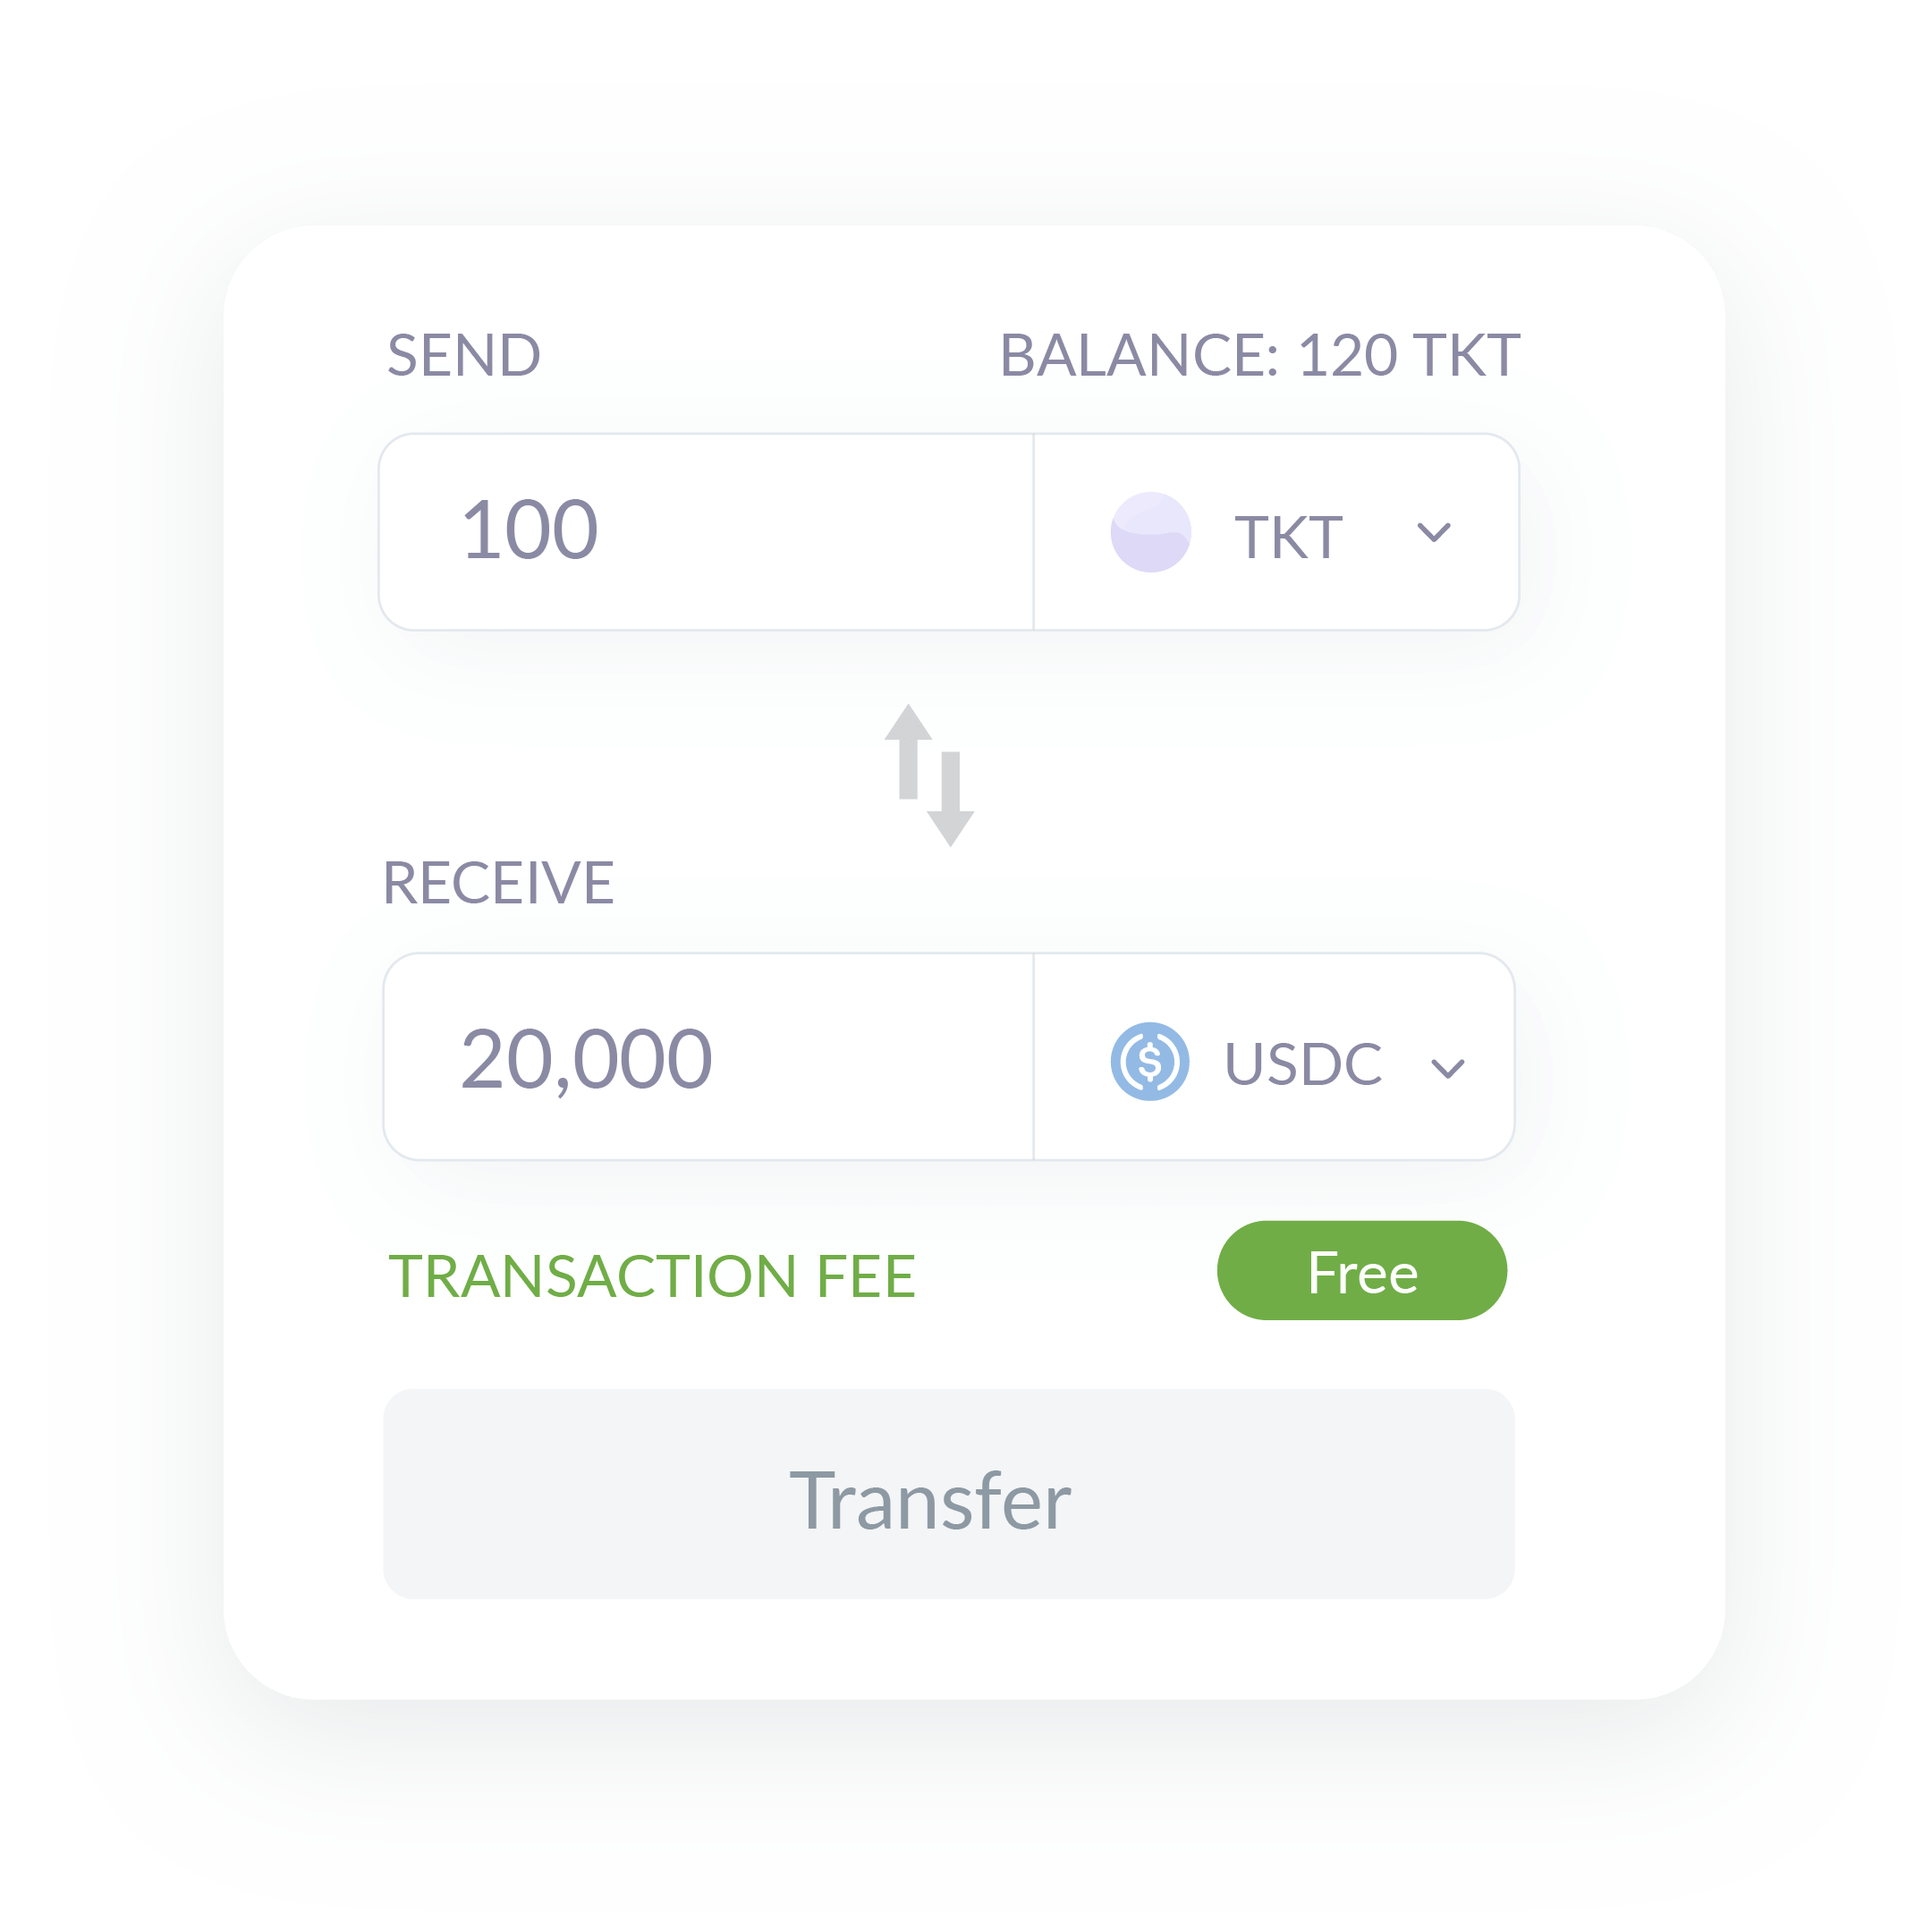 Security Token Transaction fee free